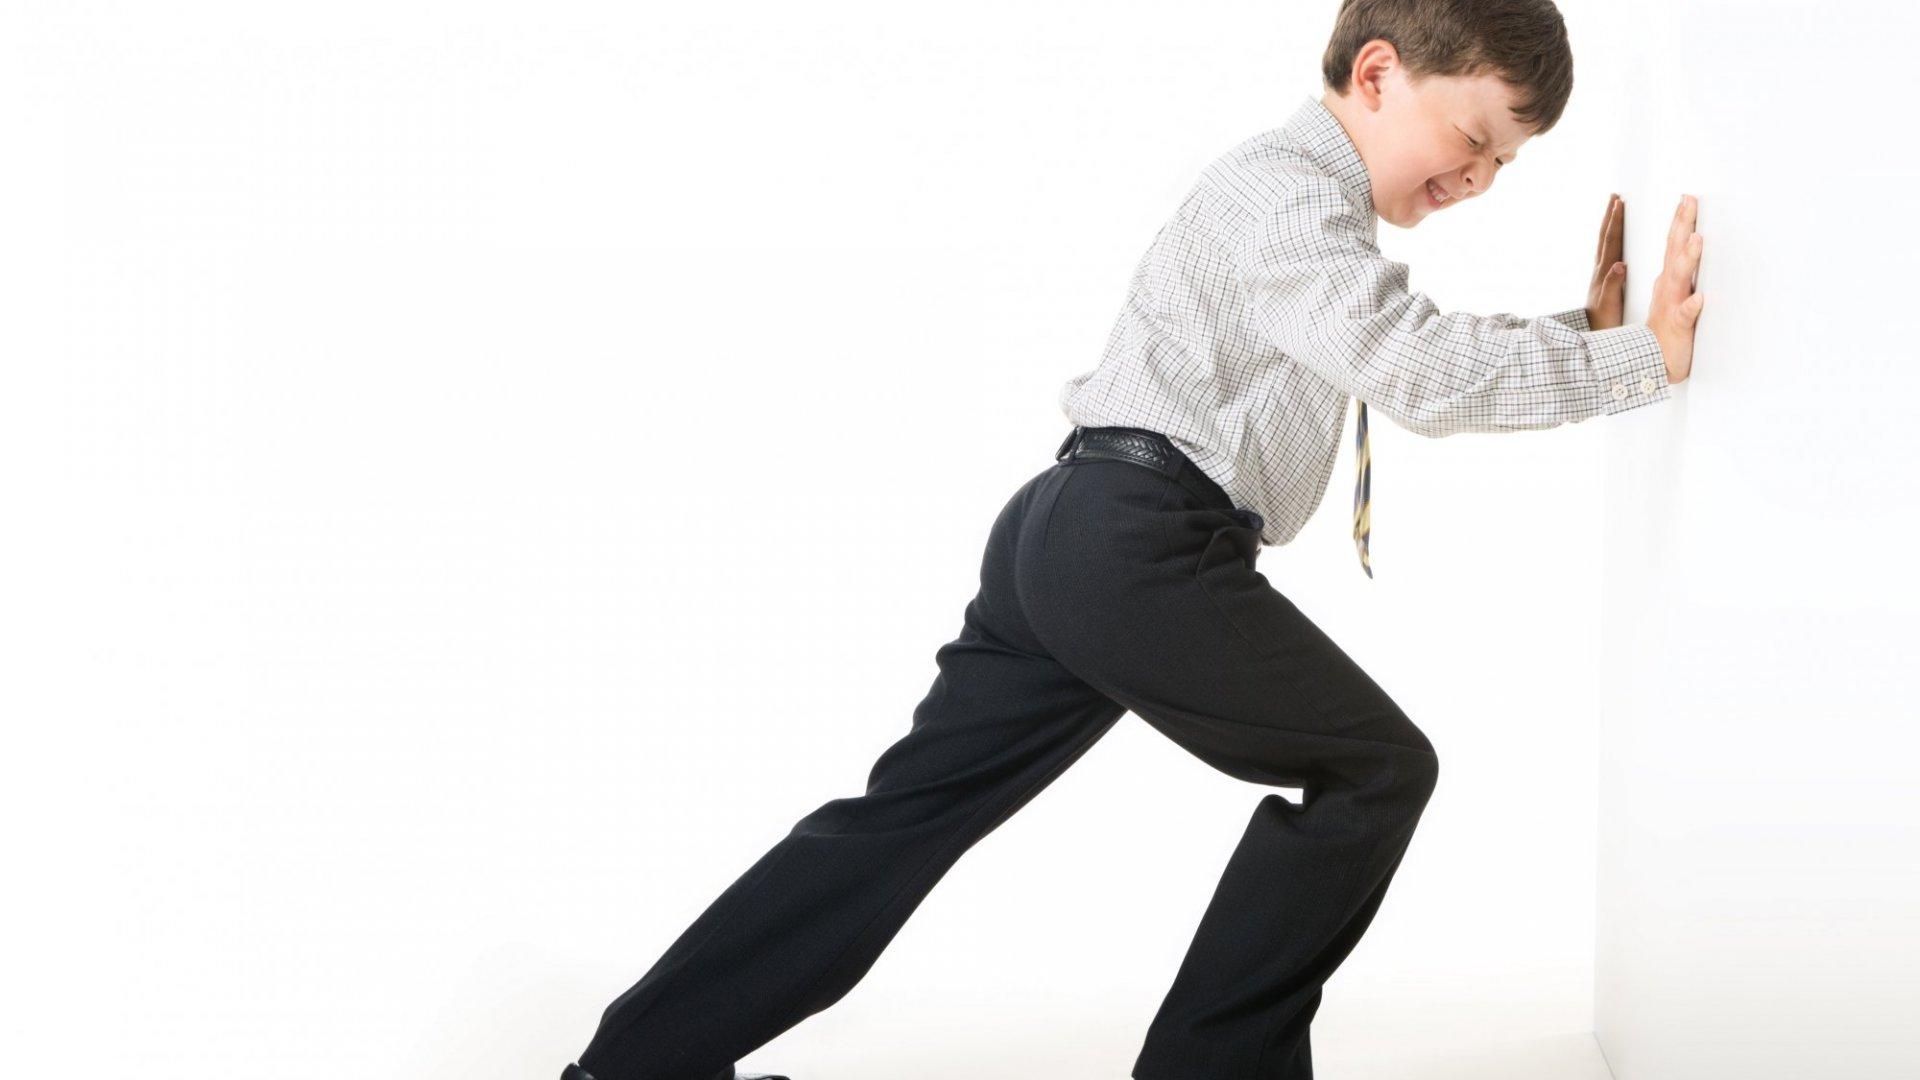 Do Childhood Struggles Determine Success?